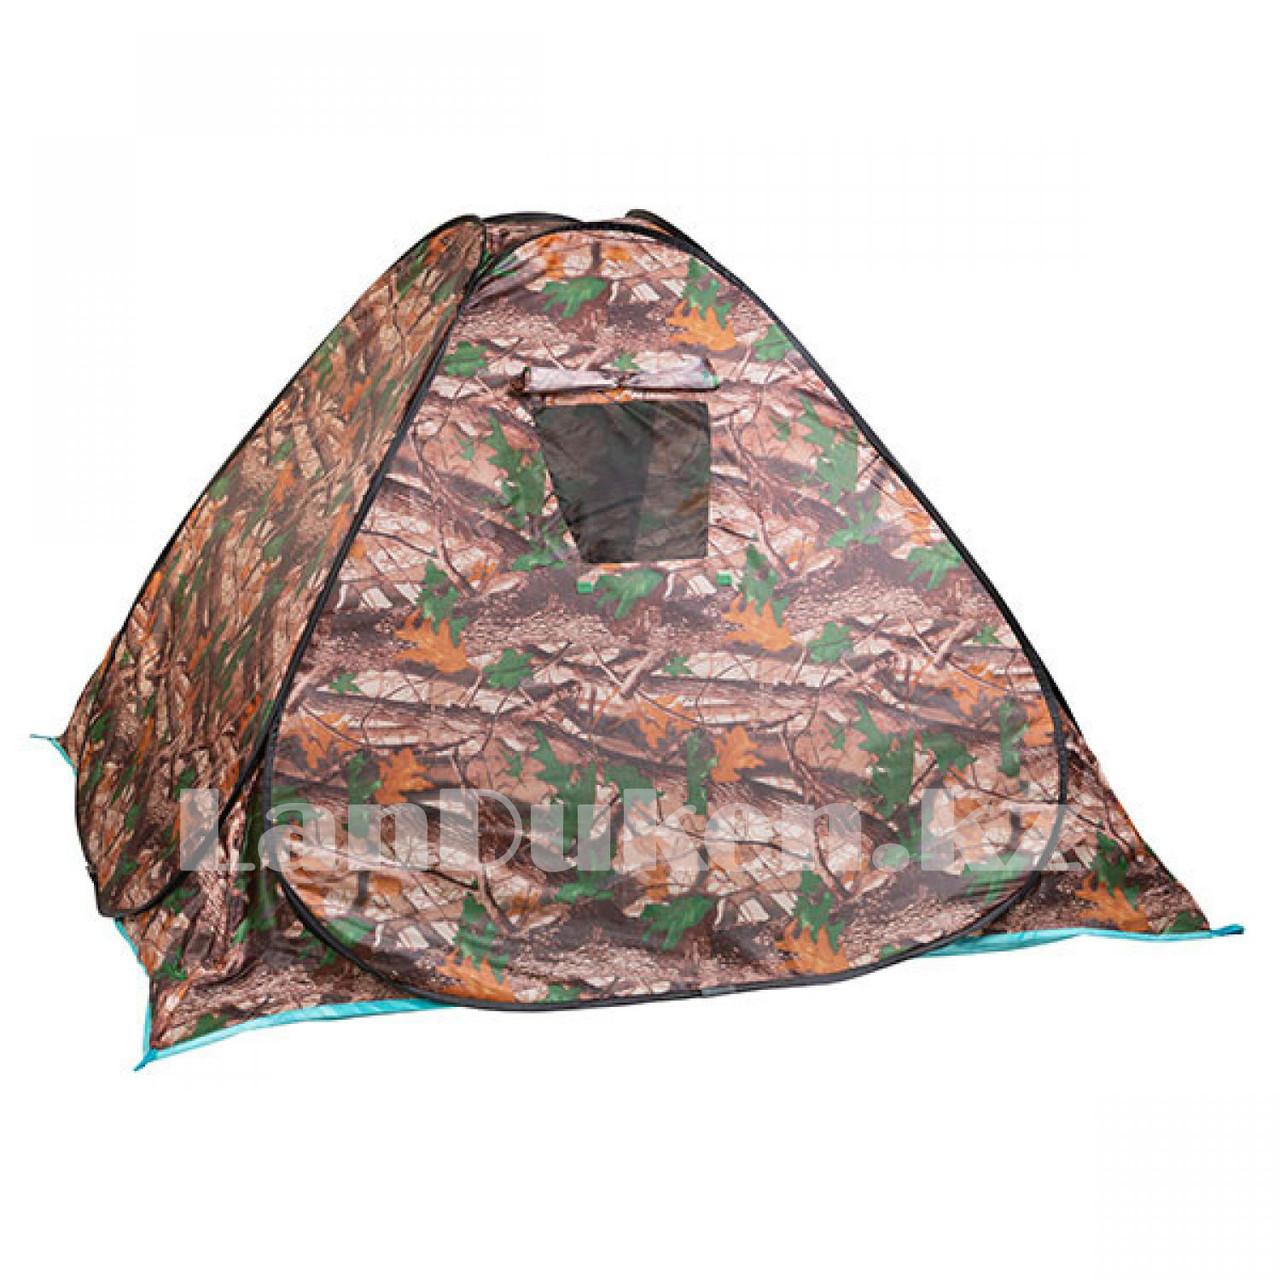 Палатка автомат 200* 200* 130 см - фото 5